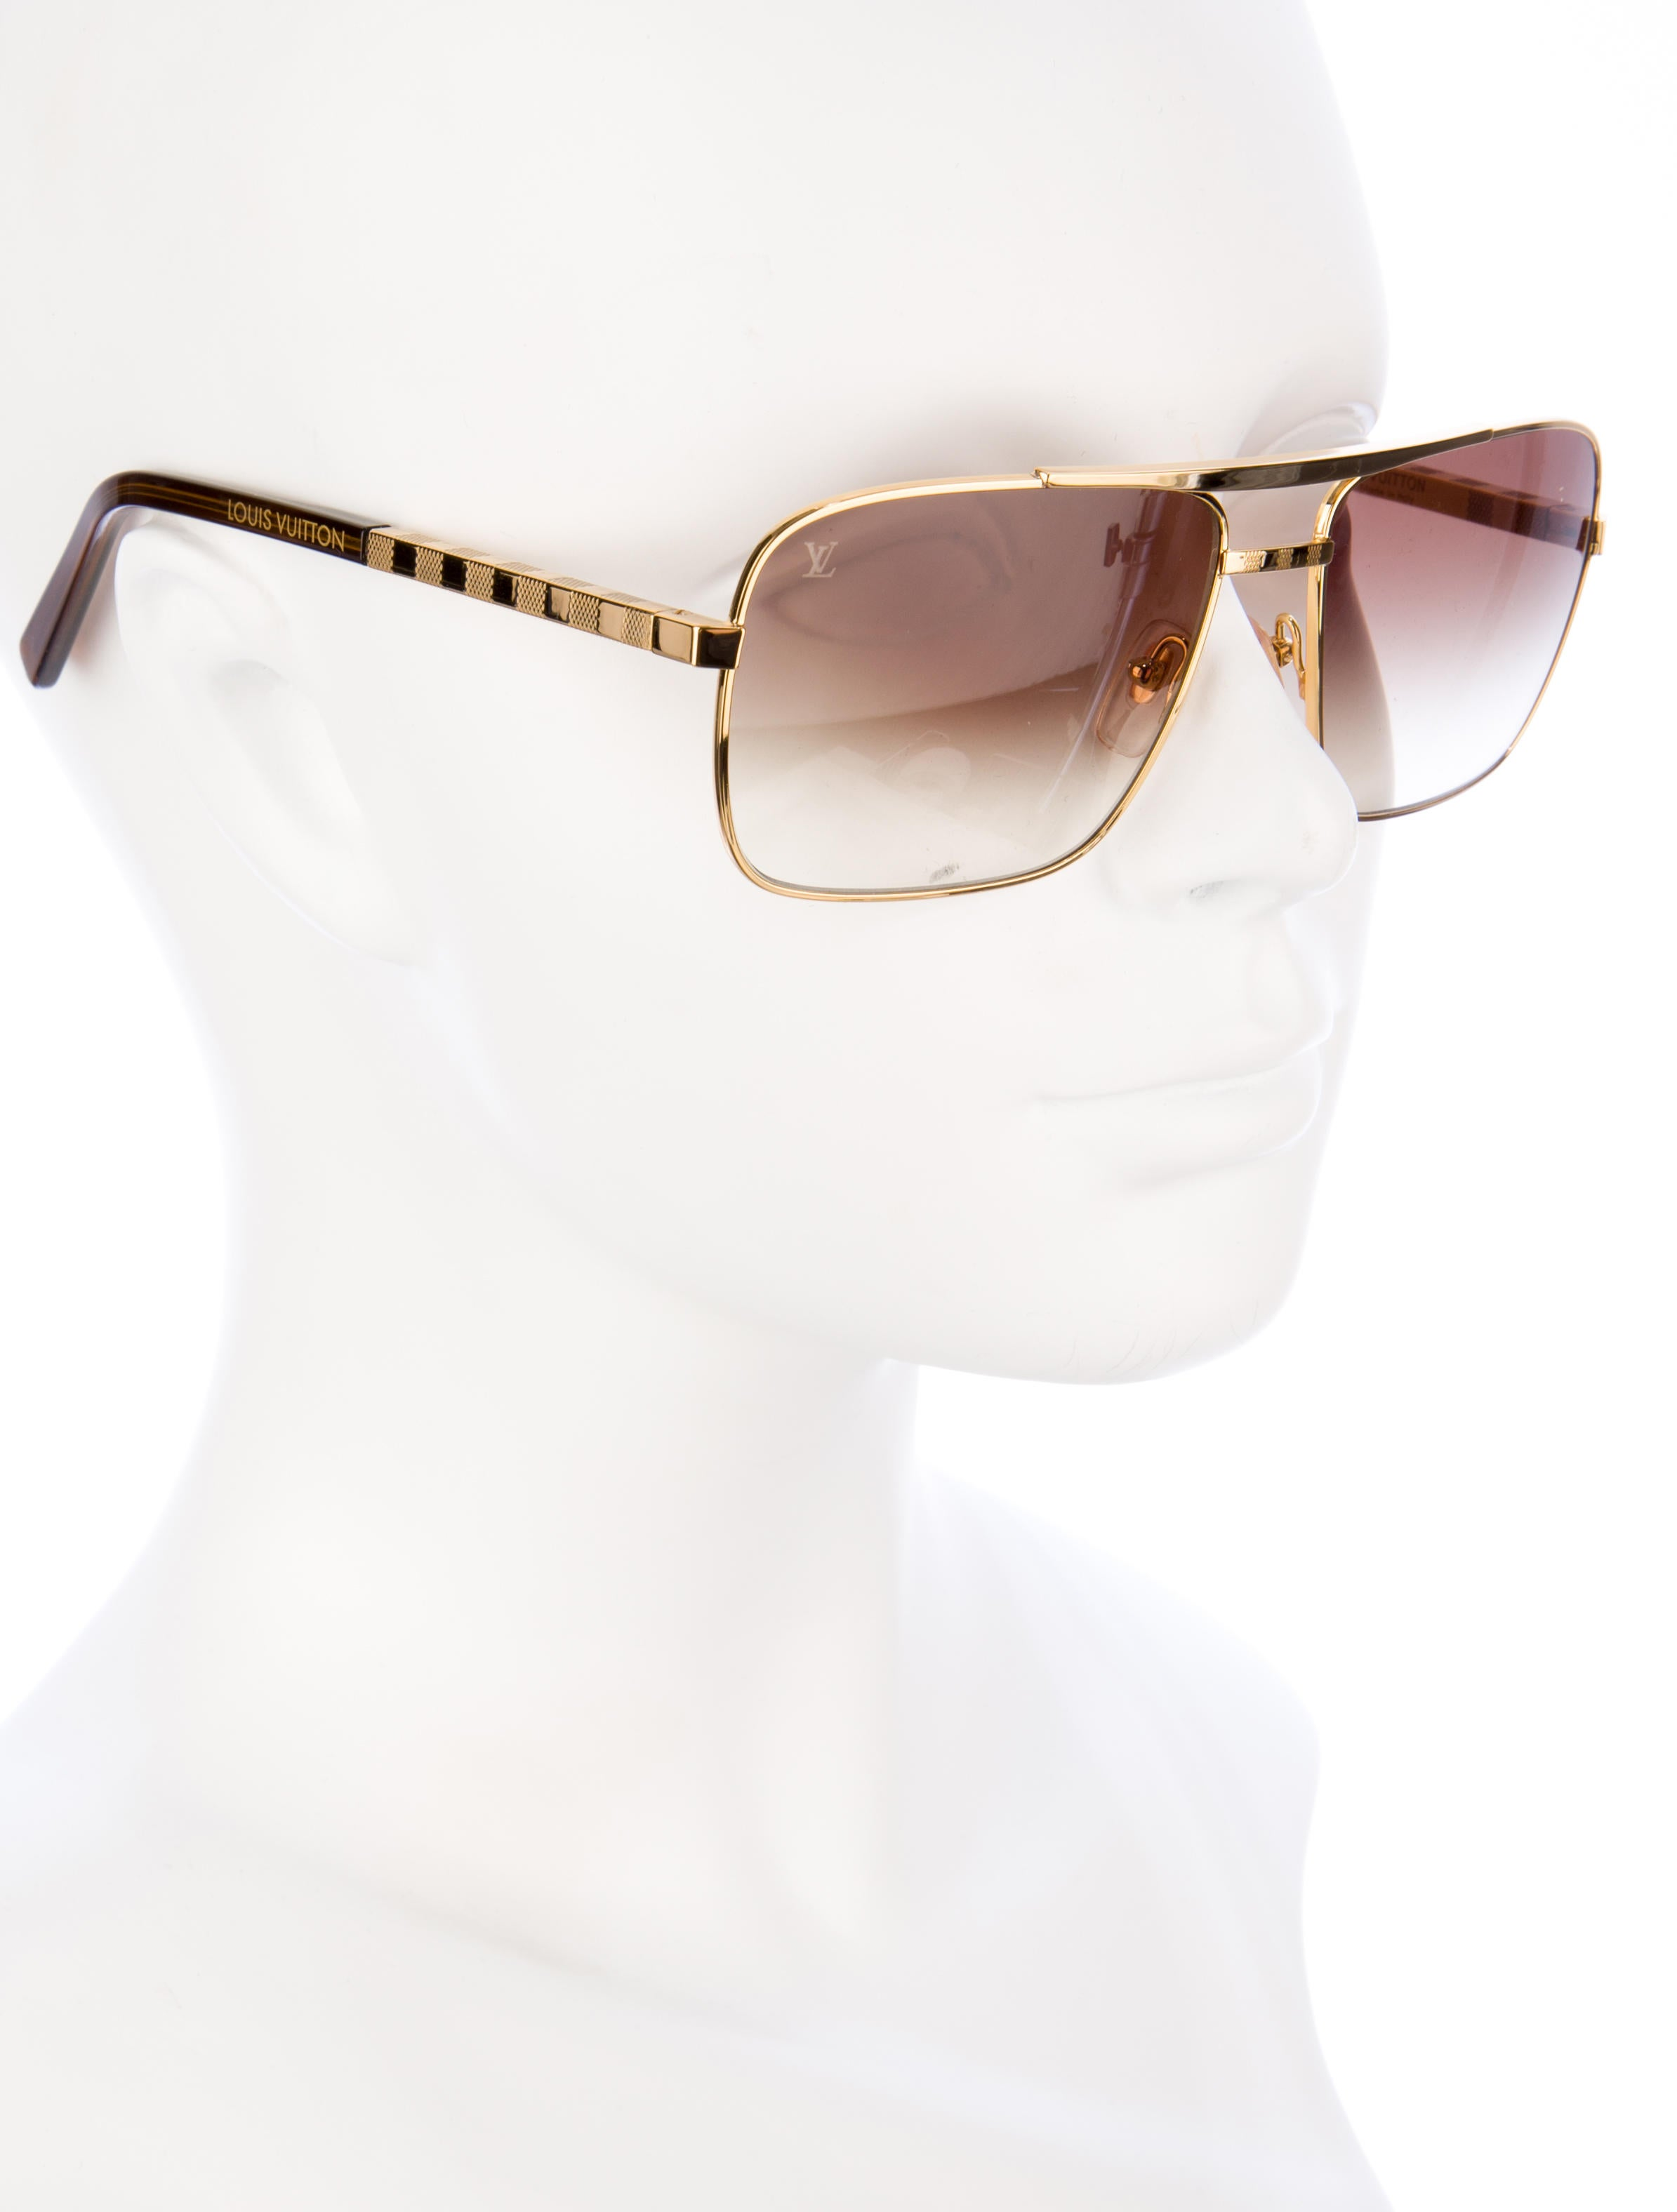 d0c4866c9950 How To Spot Fake Louis Vuitton Attitude Sunglasses - Bitterroot ...